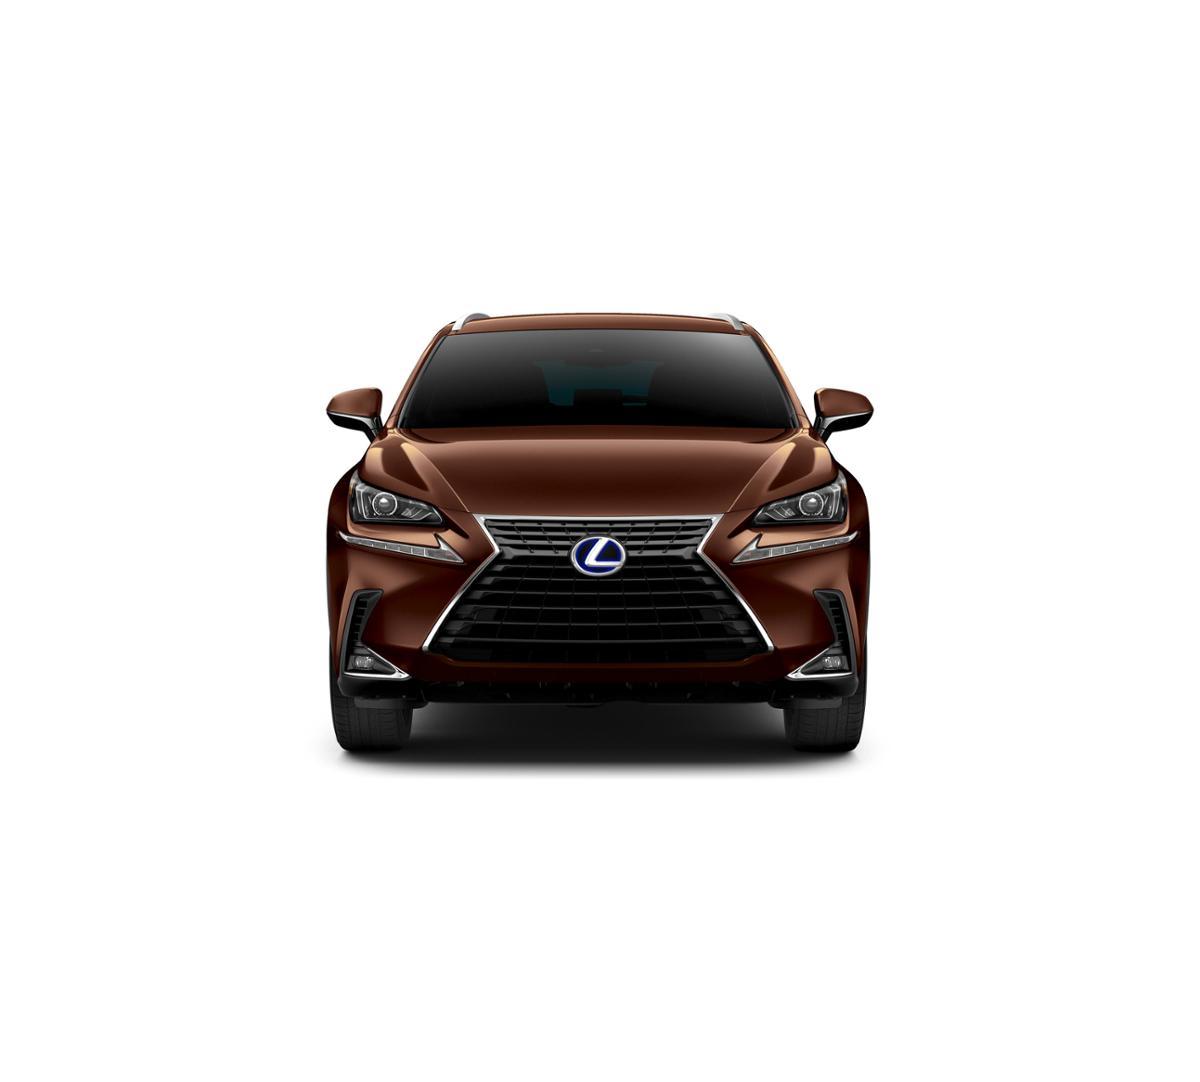 Lexus Nx300h Price: Towson Autumn Shimmer 2019 Lexus NX 300h: New Suv For Sale